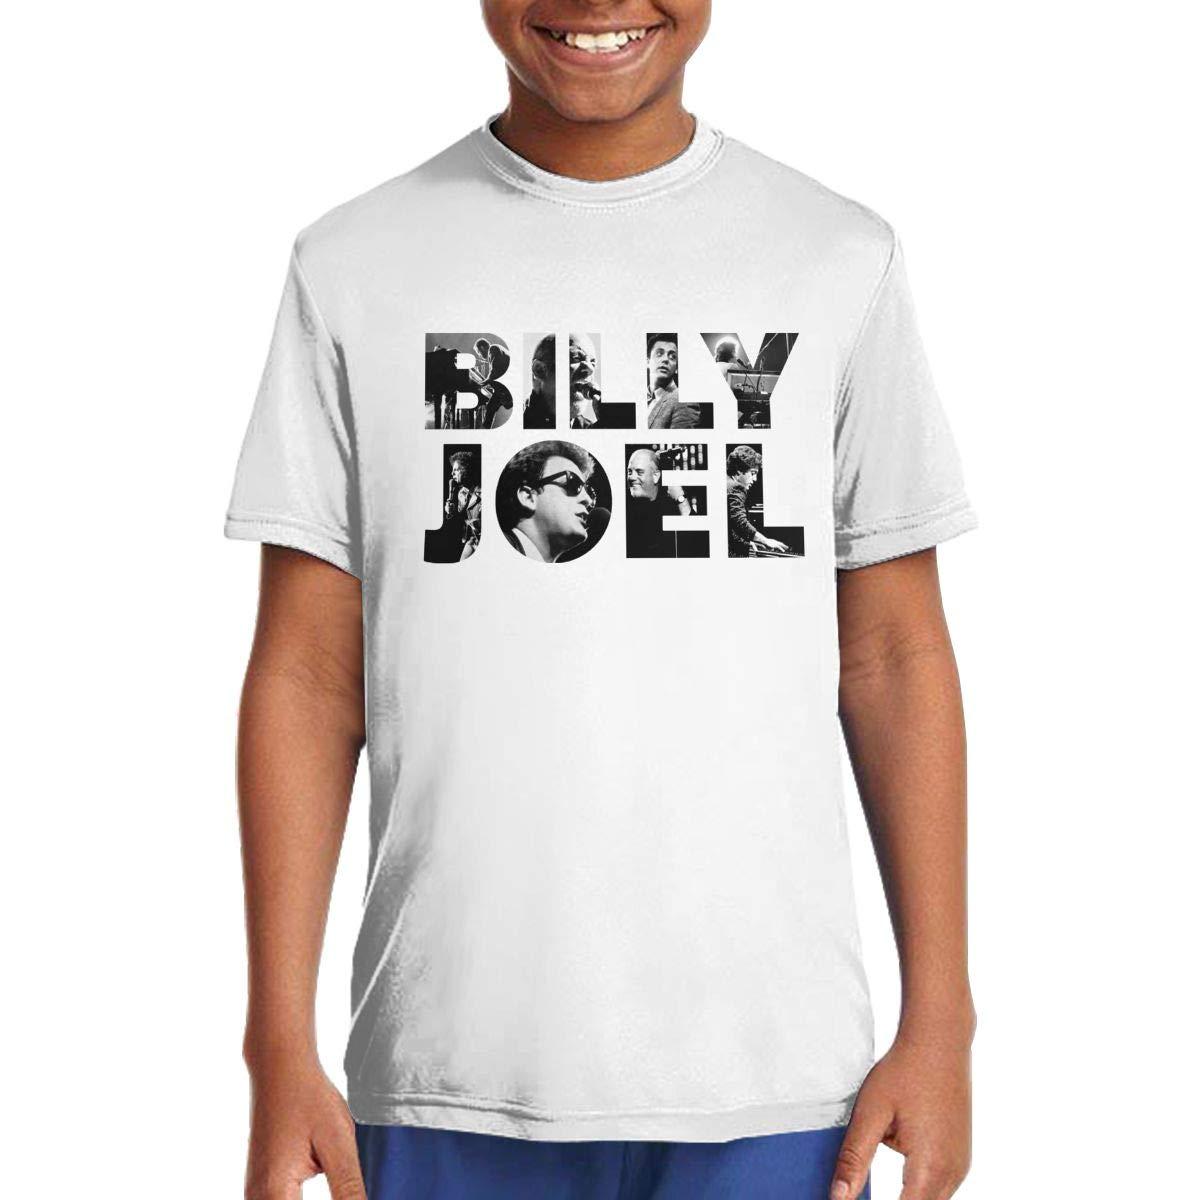 Azzomitiqing Little Boys T-Shirt Billy Joel Short Sleeve Crewneck Cotton Tee Shirt White